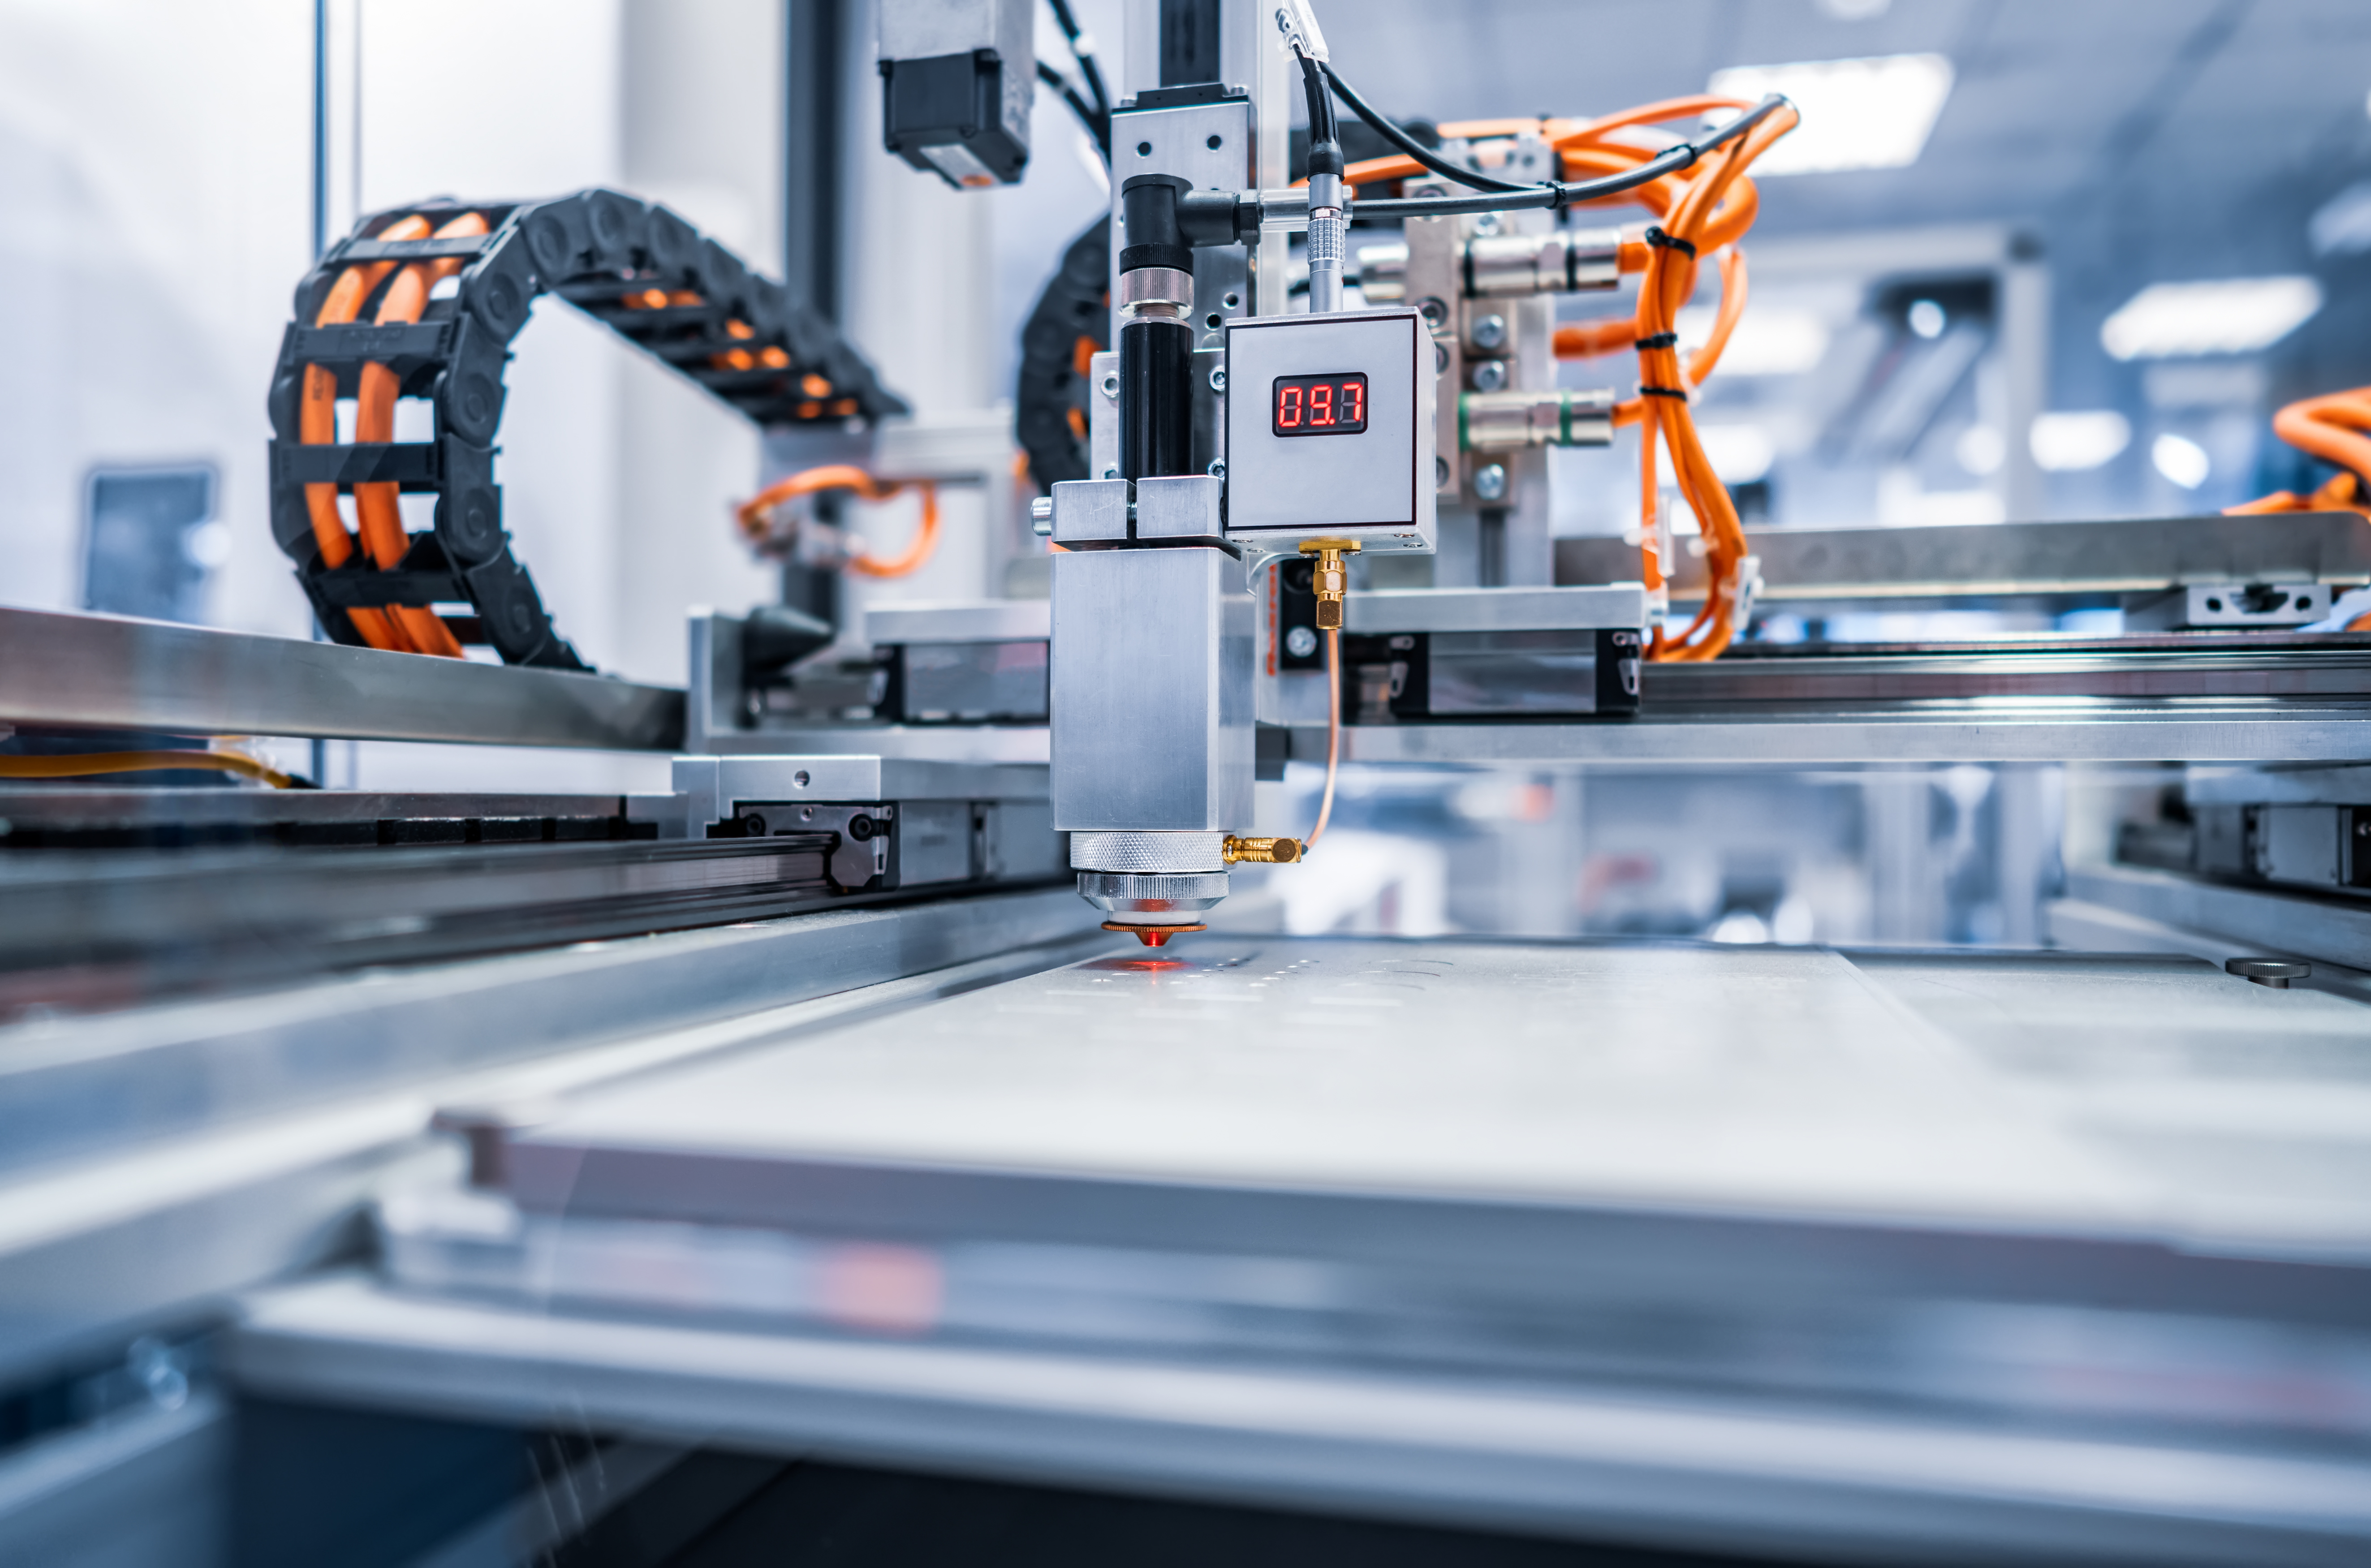 cnc-laser-cutting-of-metal-modern-industrial-techn-wzd3vrh.jpg